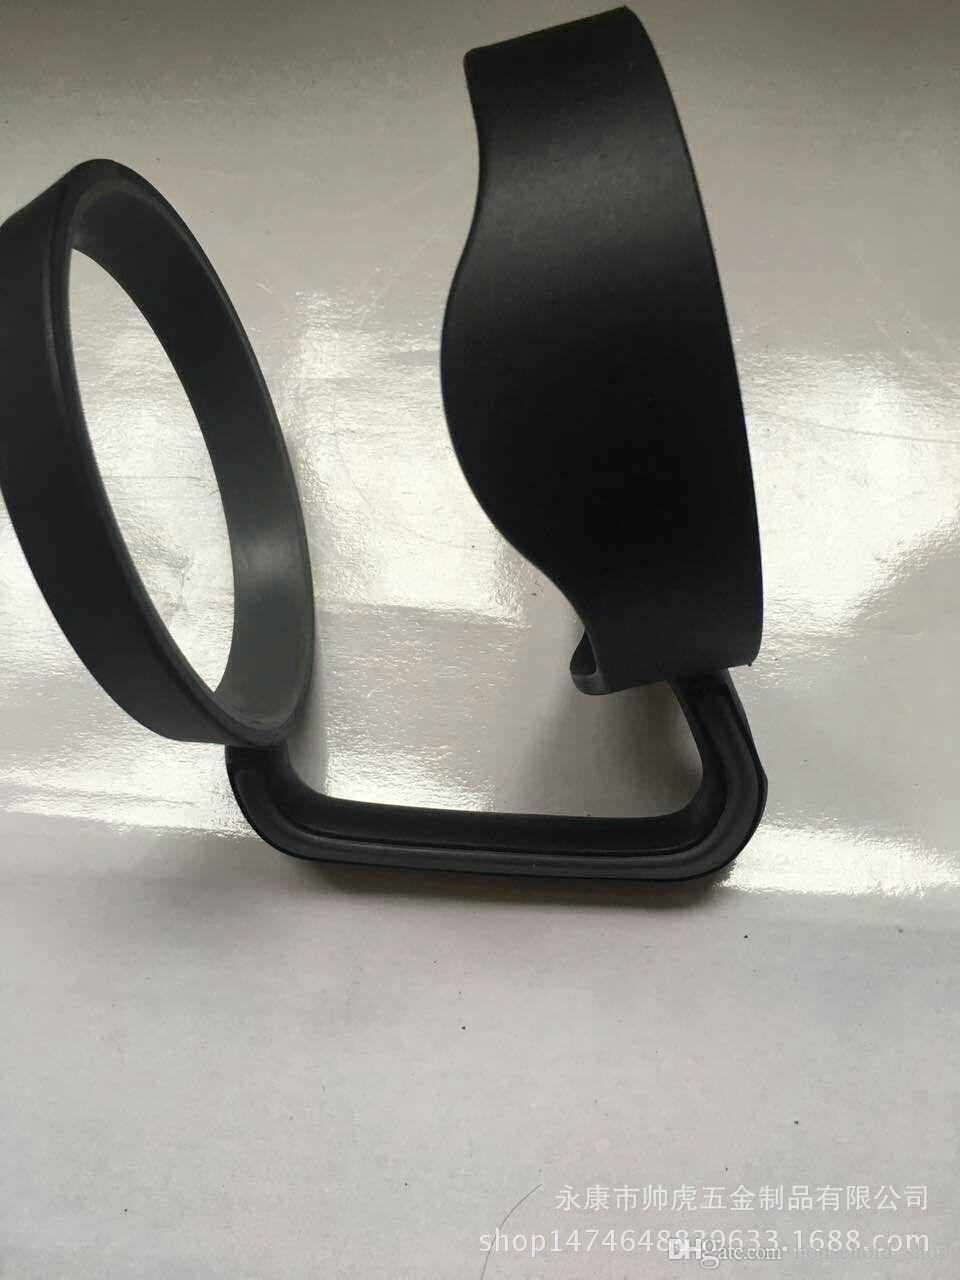 Kupalar Tutucu ForRocky Dağ Kolu 840 ml Plastik Bardak Siyah Kolu El Tutucu Fit Seyahat Kupalar Drinkware